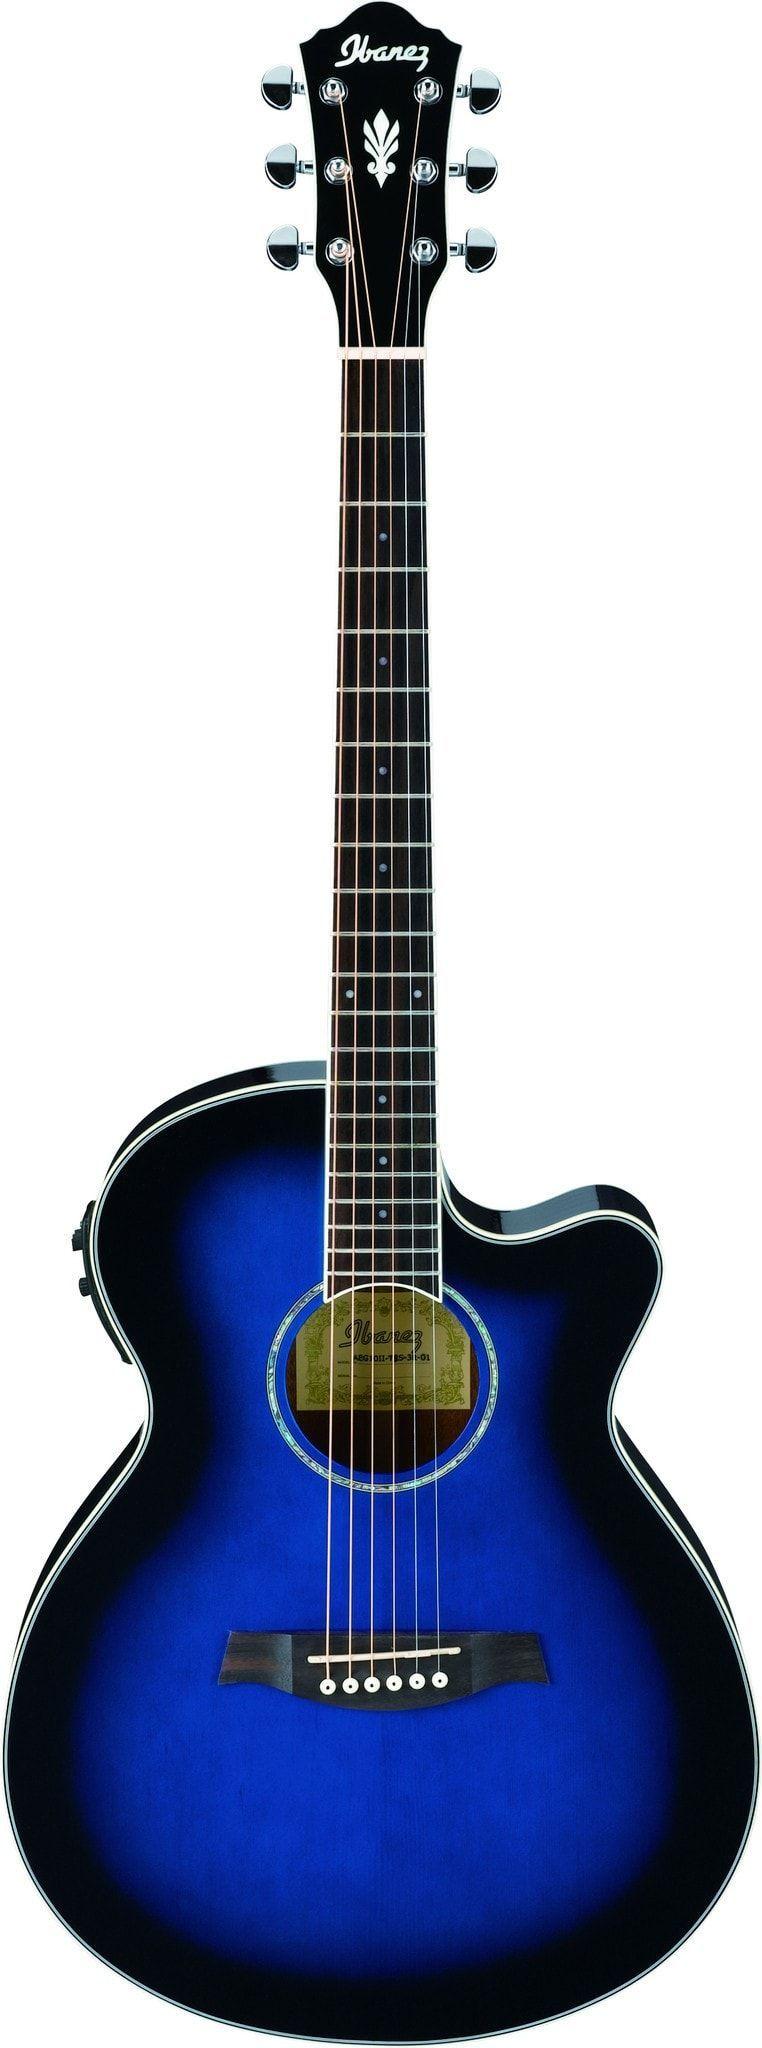 ibanez aeg10ii ae series acoustic electric guitar music guitar blue acoustic guitar. Black Bedroom Furniture Sets. Home Design Ideas